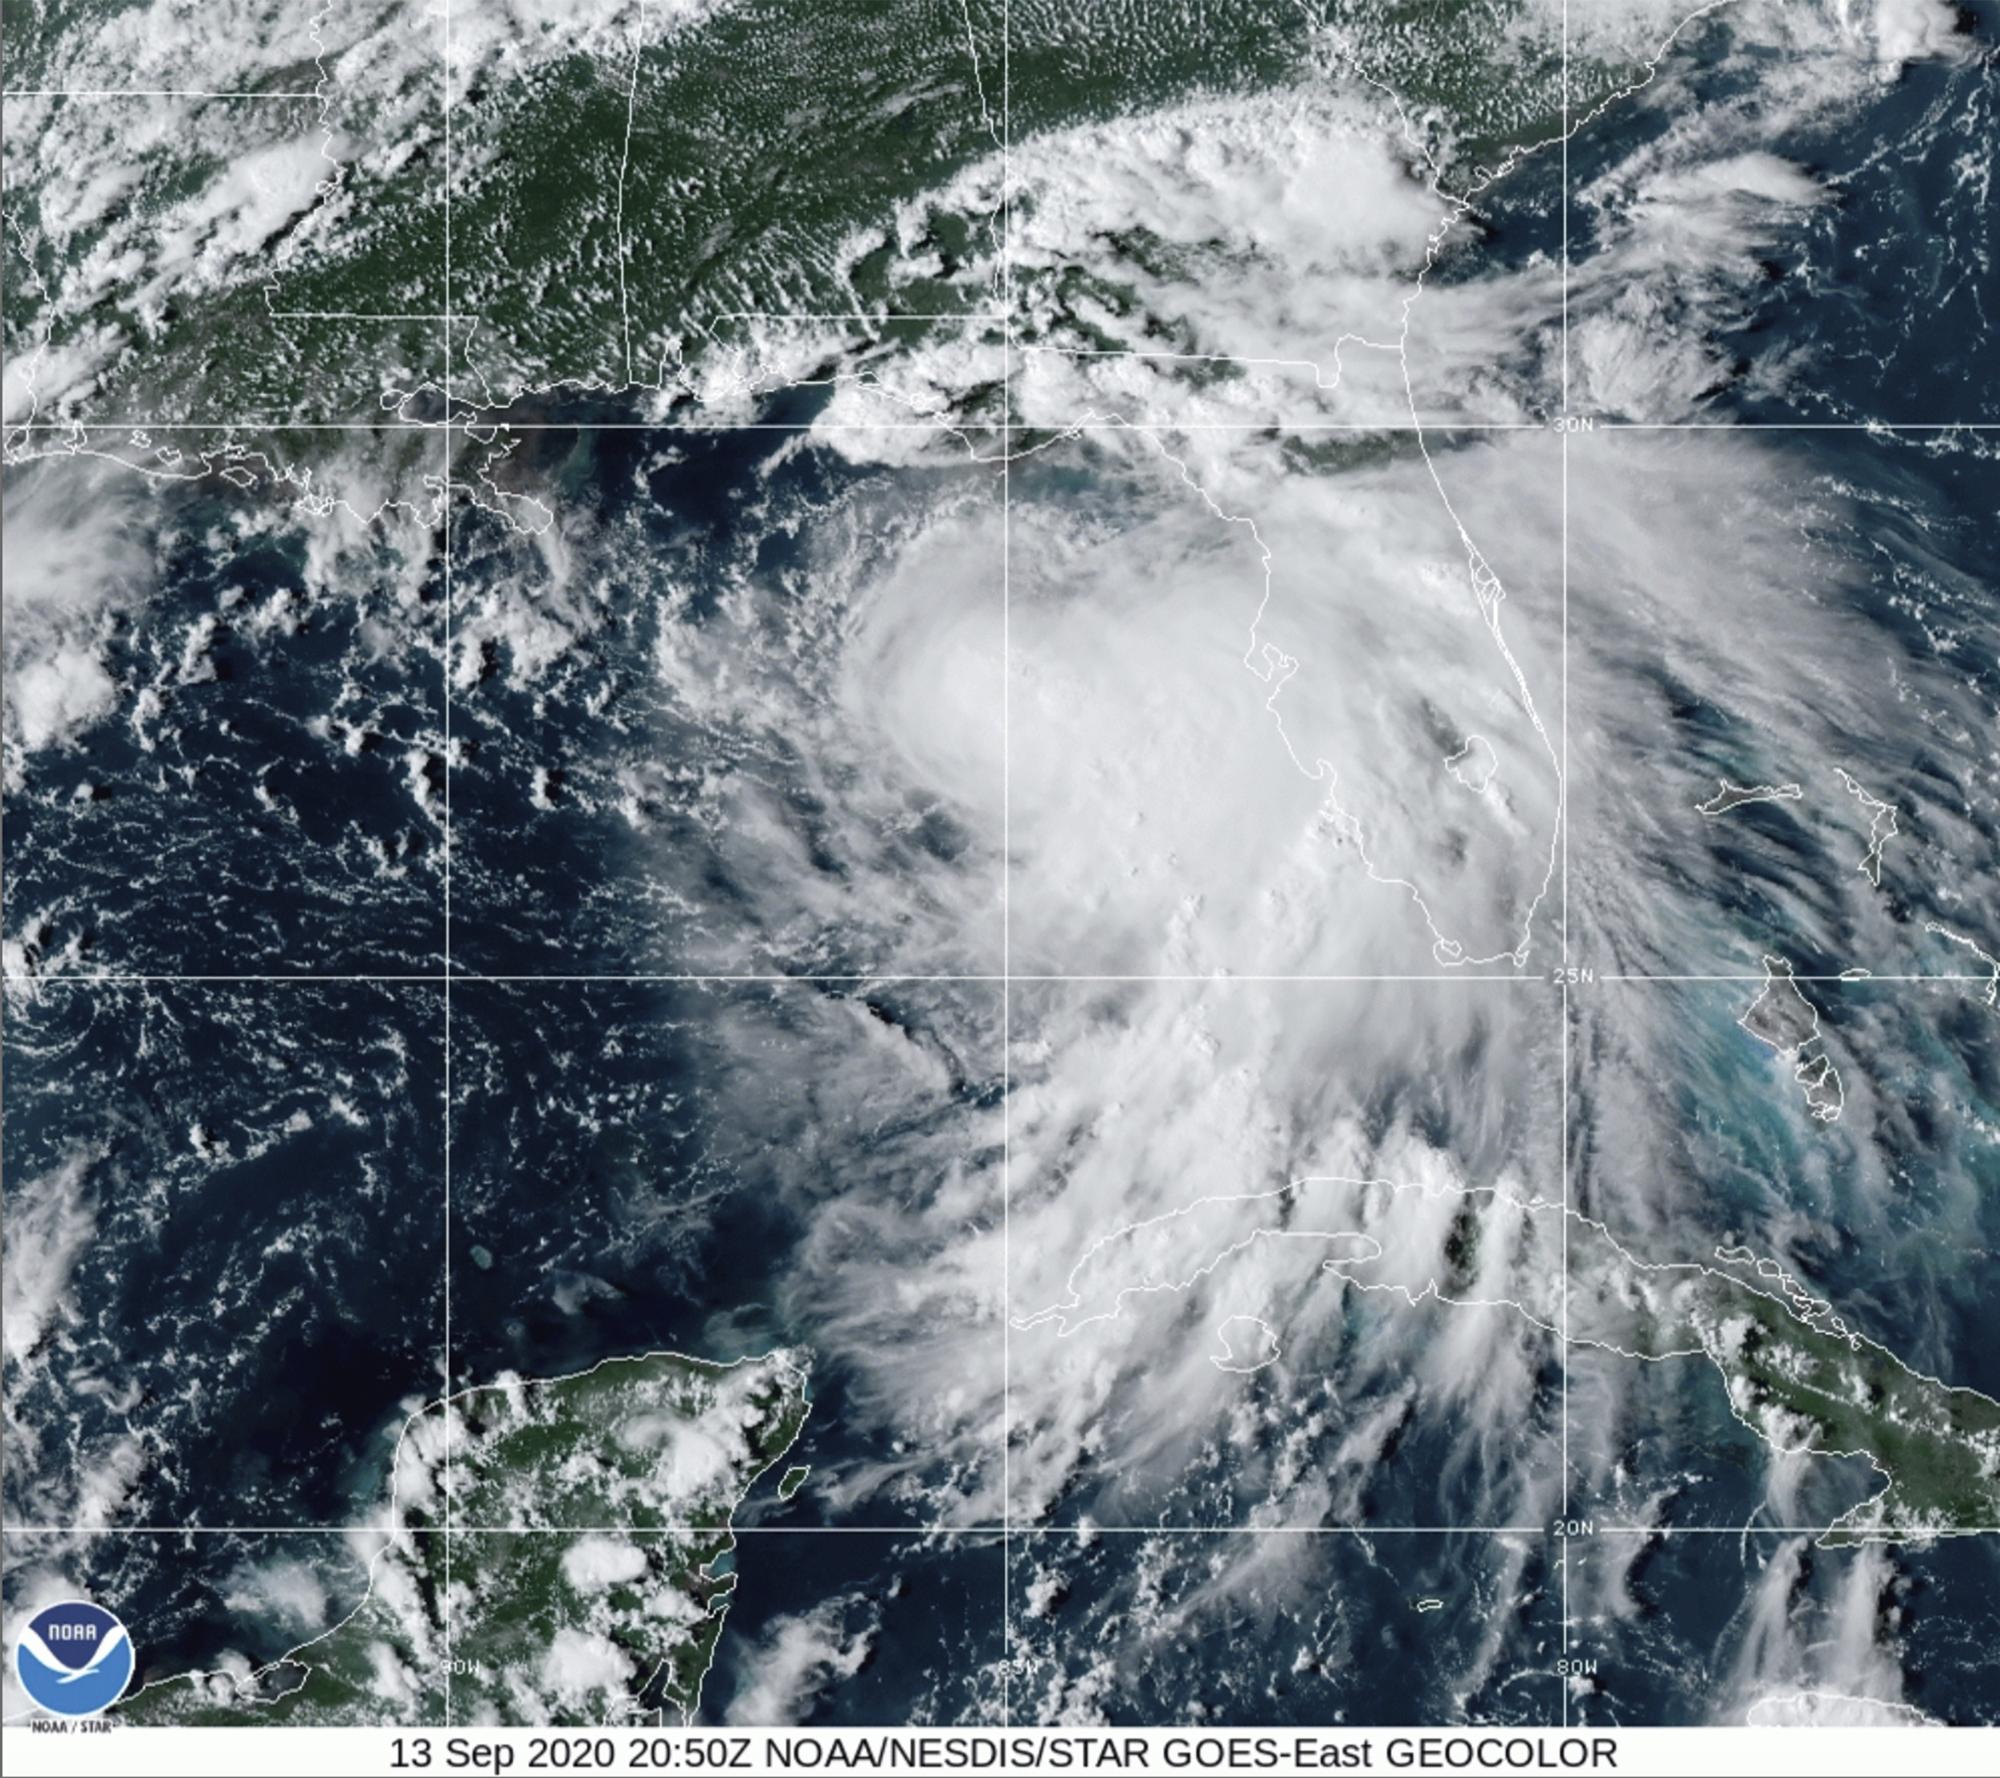 Sallys threat: Potentially historic floods, fierce winds